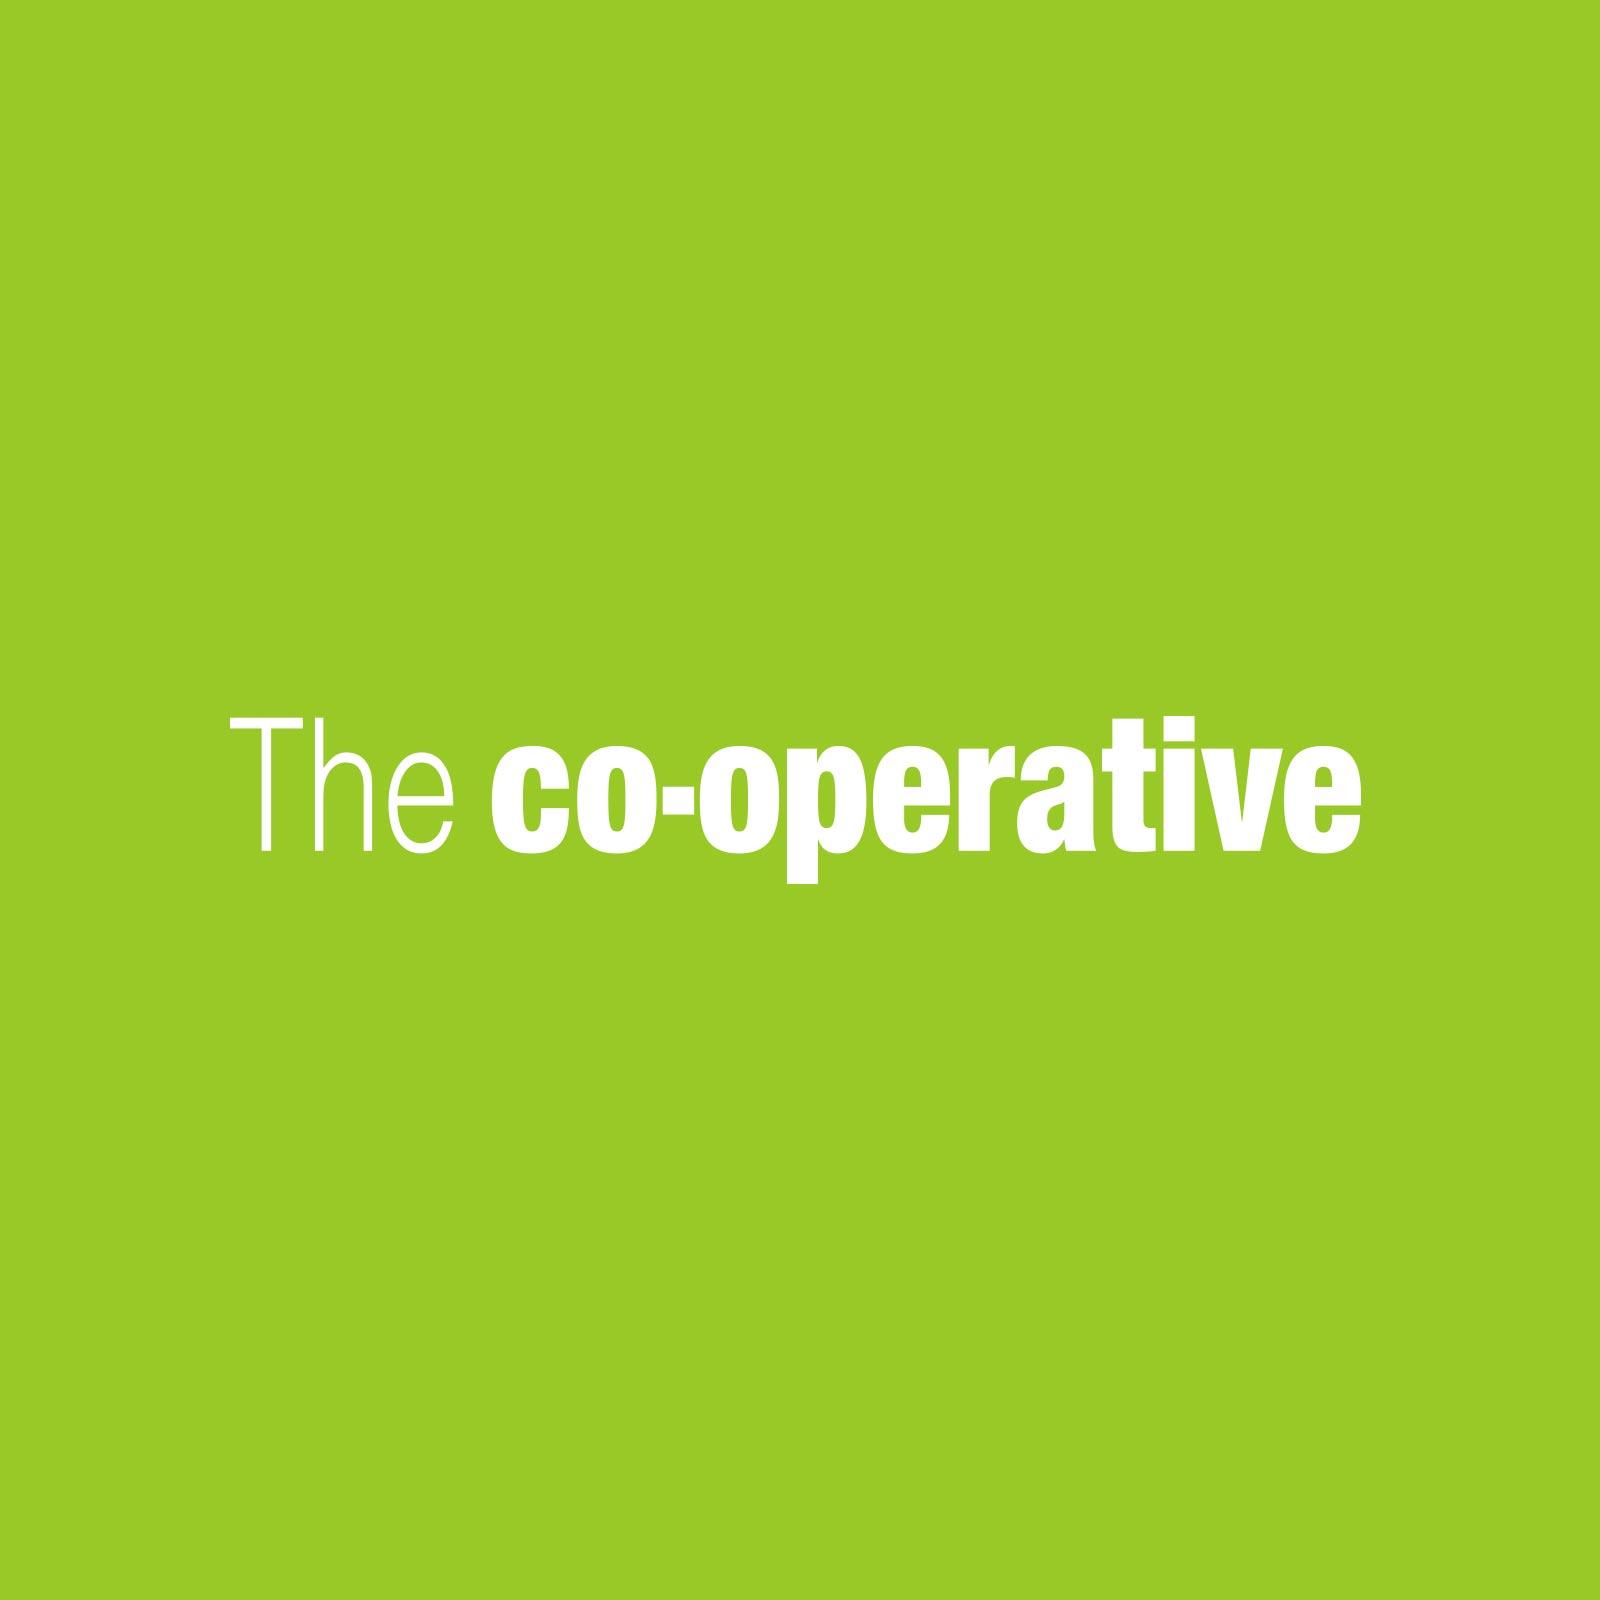 The-co-operative-logo_V2.jpg